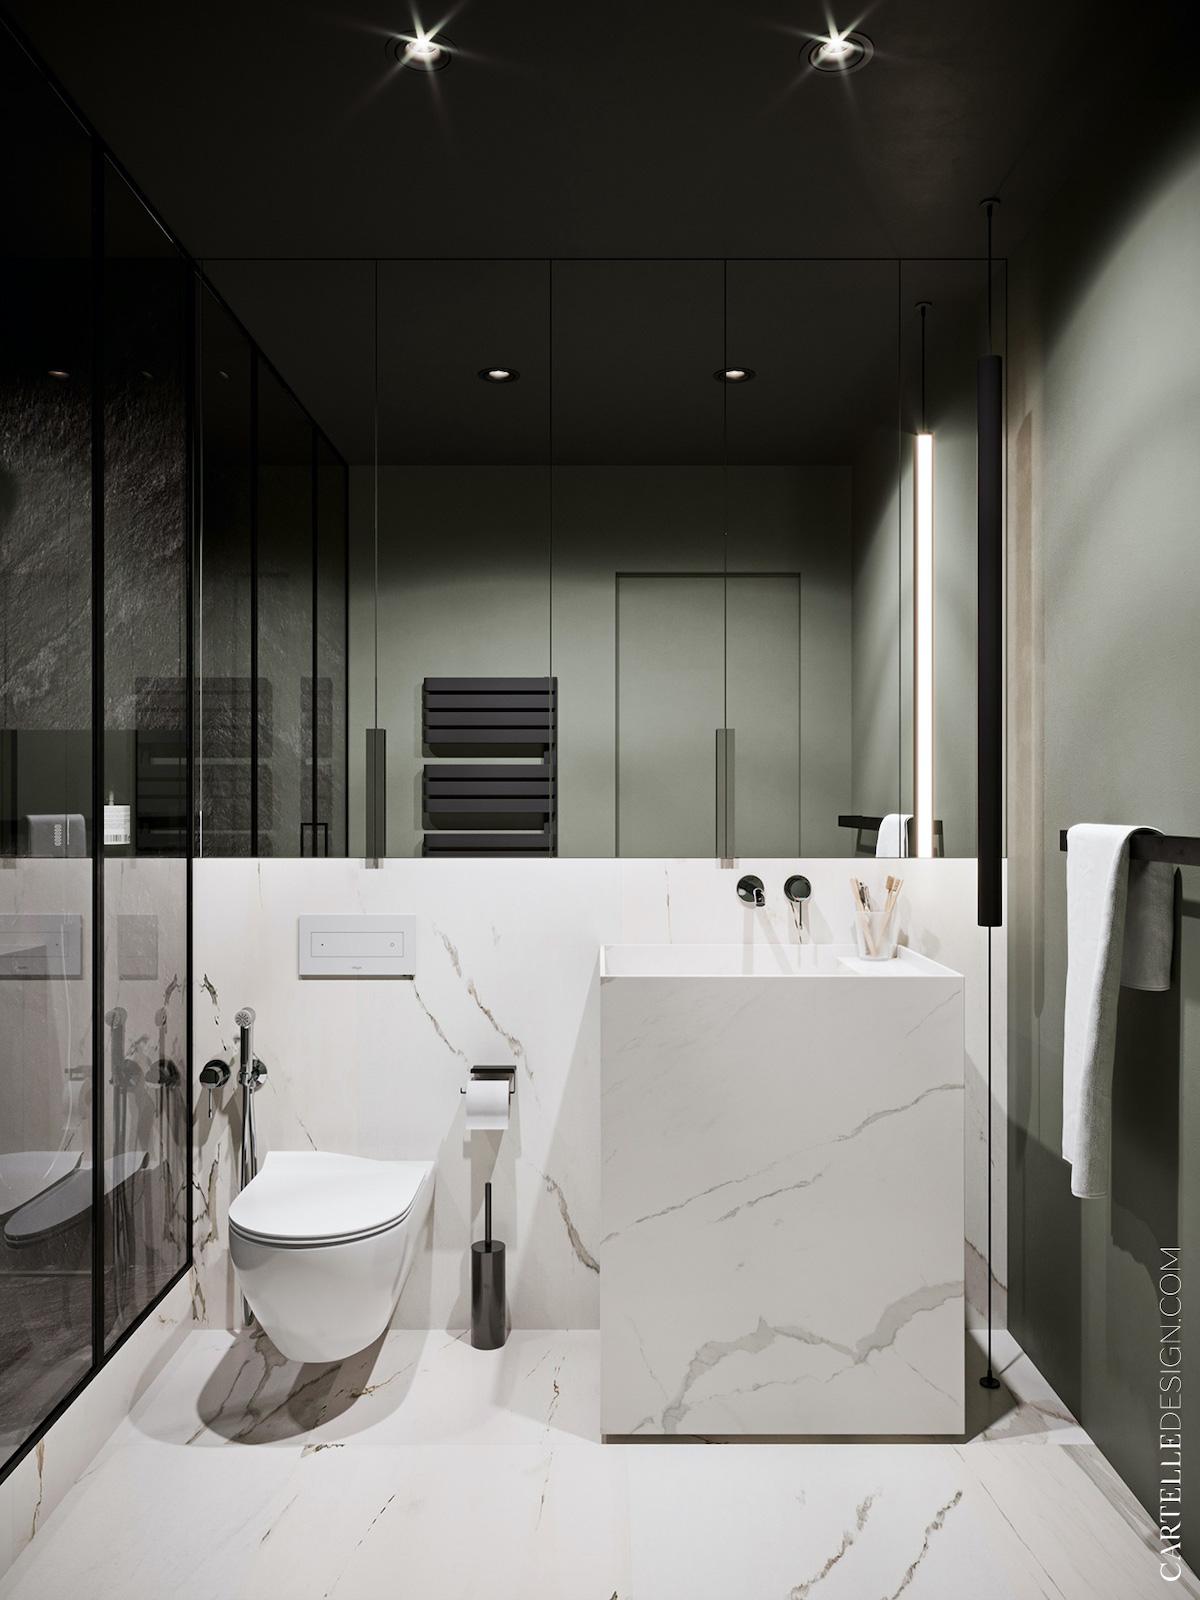 salle de bains vert olive kaki noir blanc - blog déco clemaroundthecorner